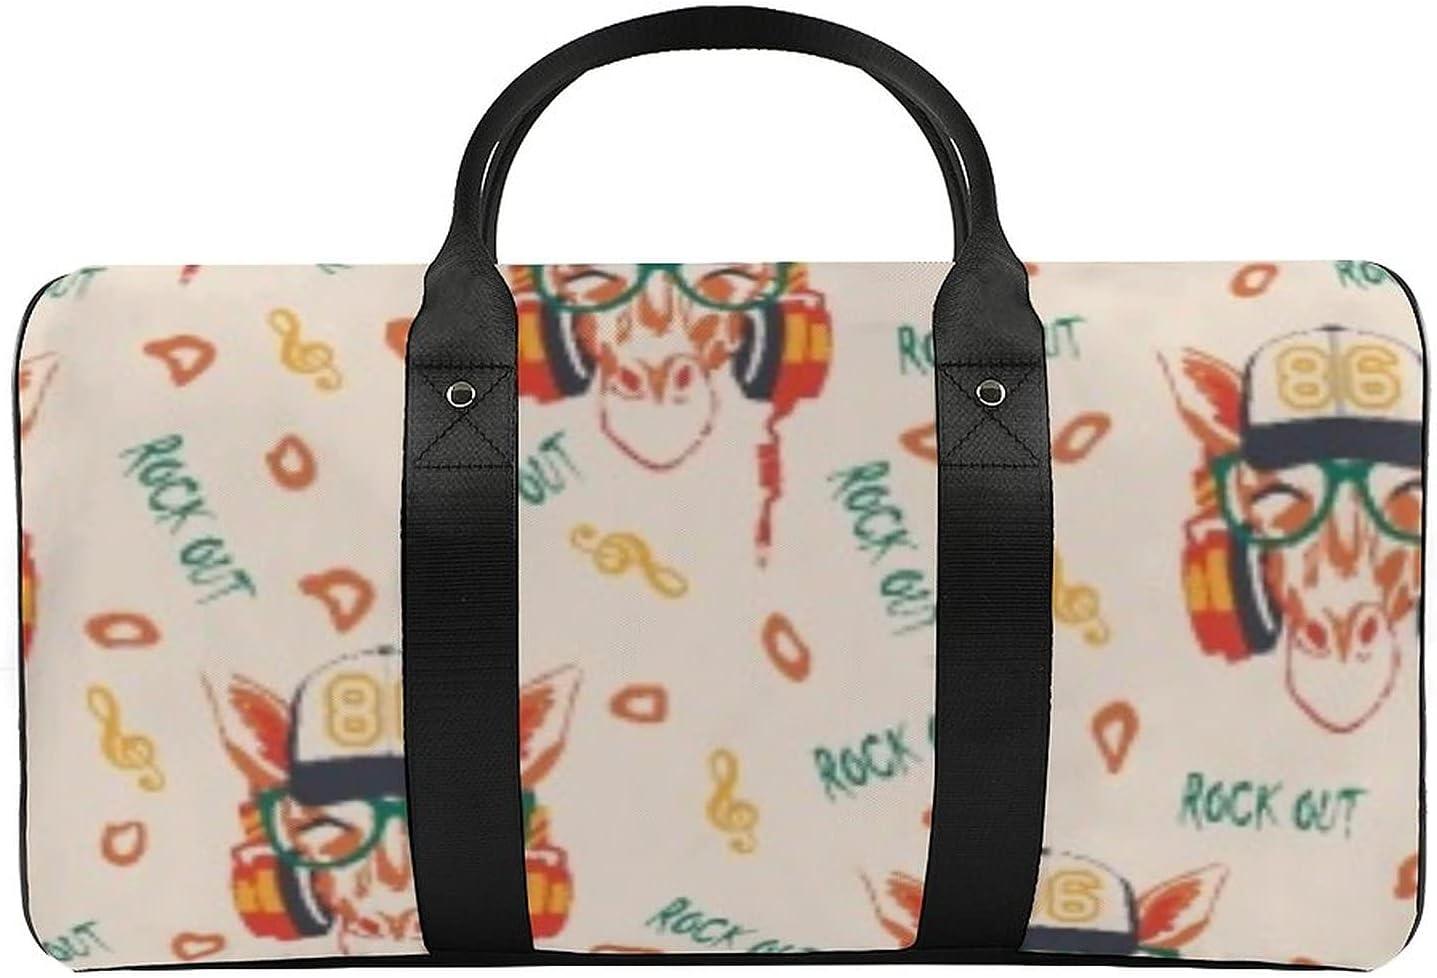 Rock Deer Sports Gym Bag Travel Max 66% OFF with bag Wet Pocket Omaha Mall Sh Duffel